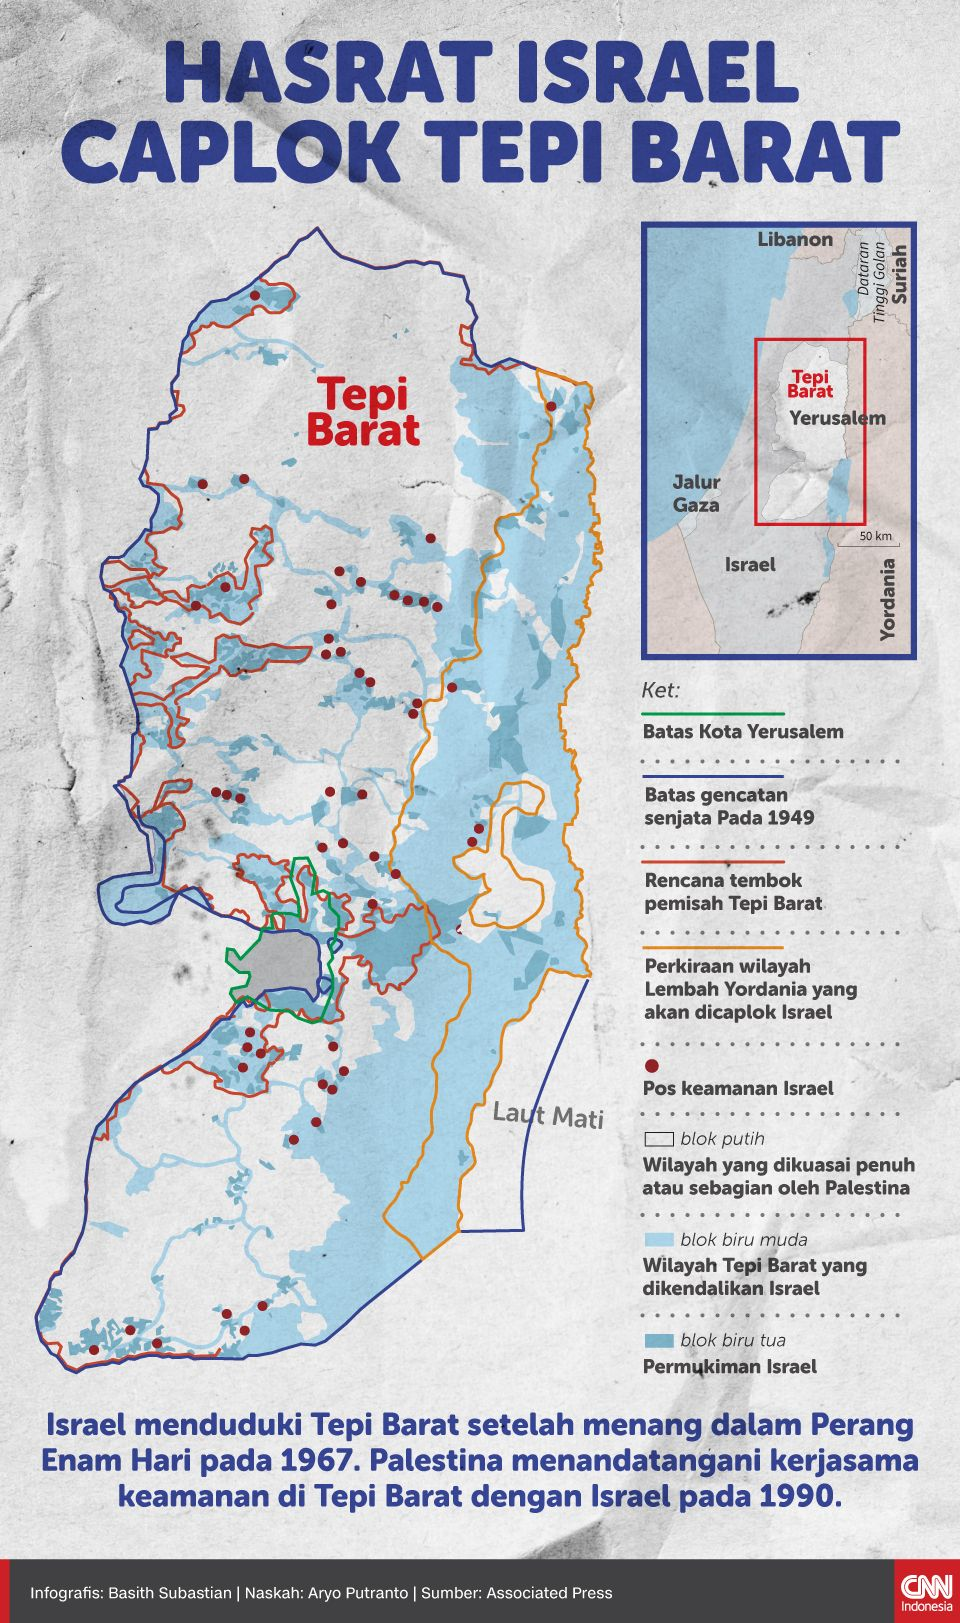 Infografis Hasrat Israel Caplok Tepi Barat